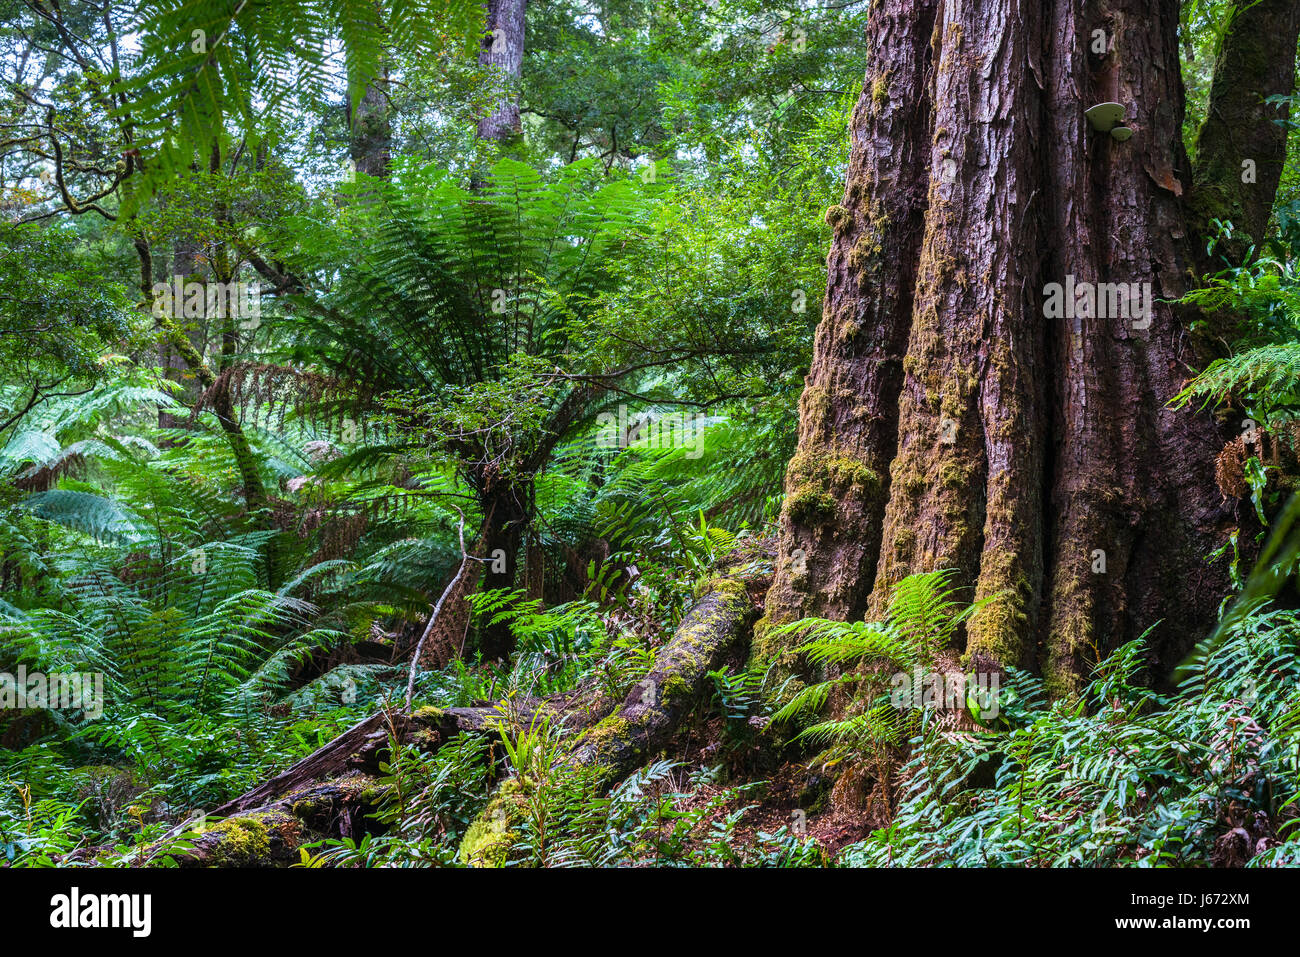 Dicksonia antarctica rain forest en Melba Gully State Park, el Parque Nacional Gran Otway, Vitoria, Australia. Imagen De Stock